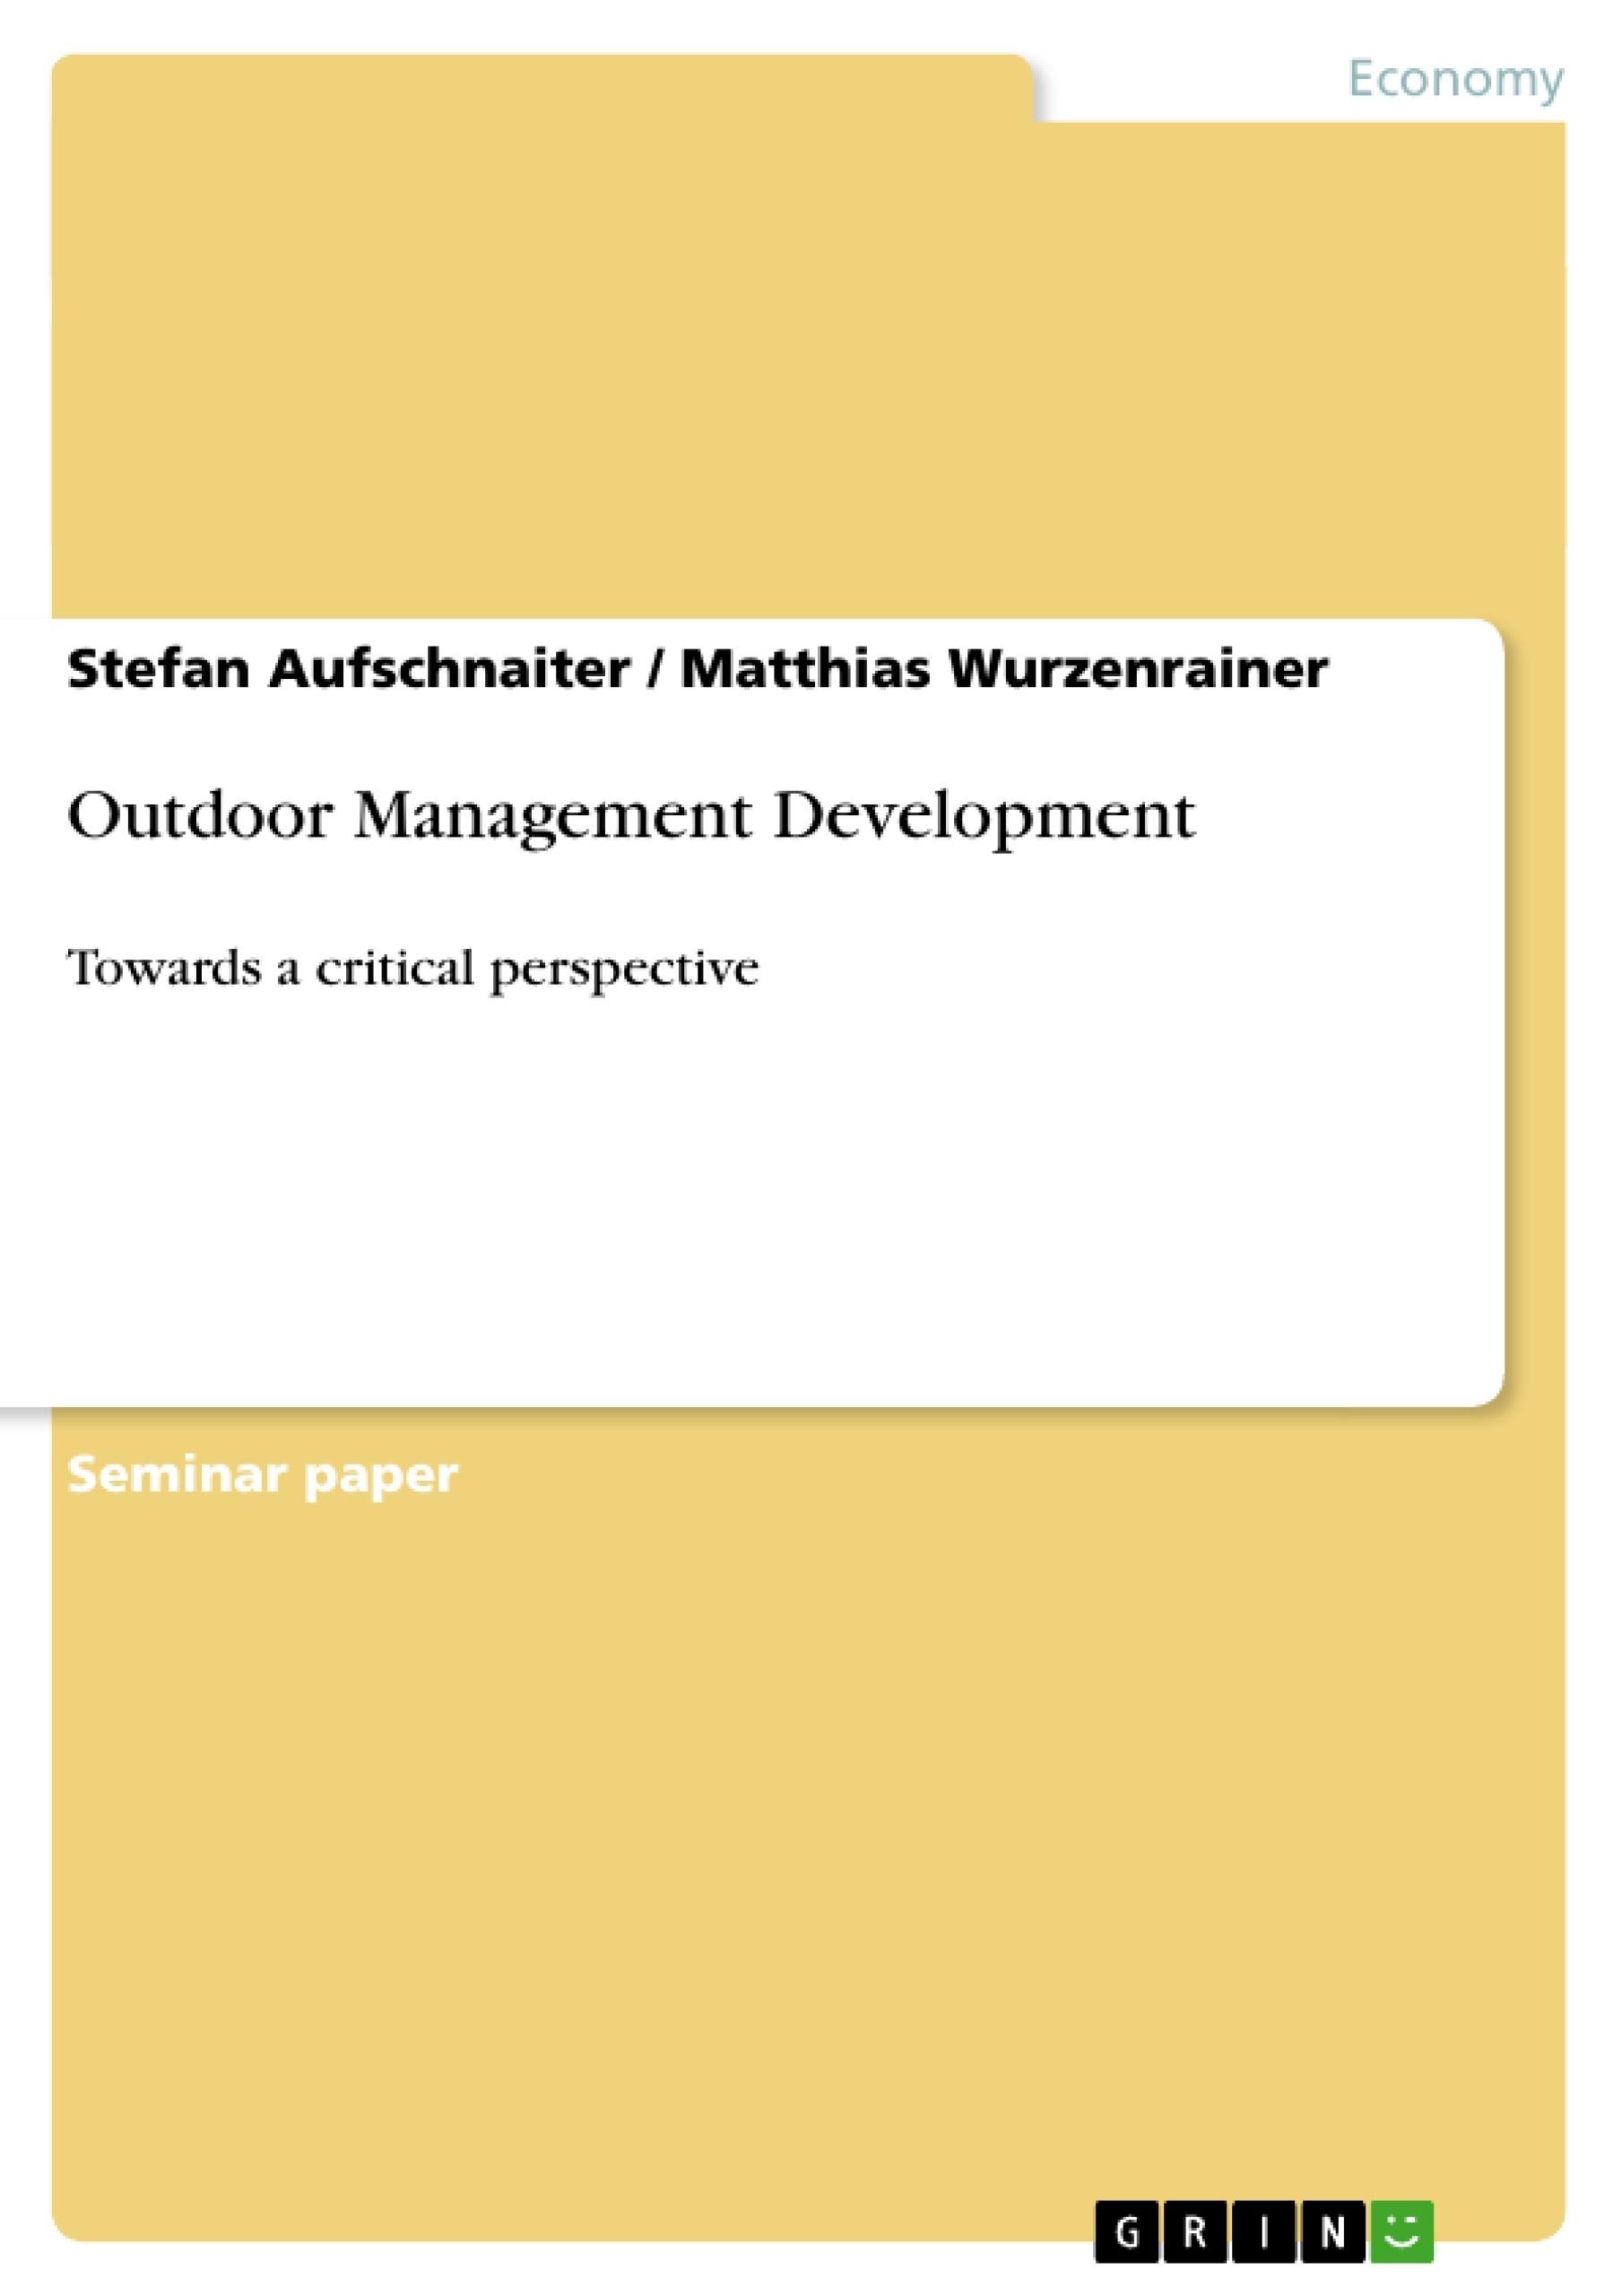 Title: Outdoor Management Development